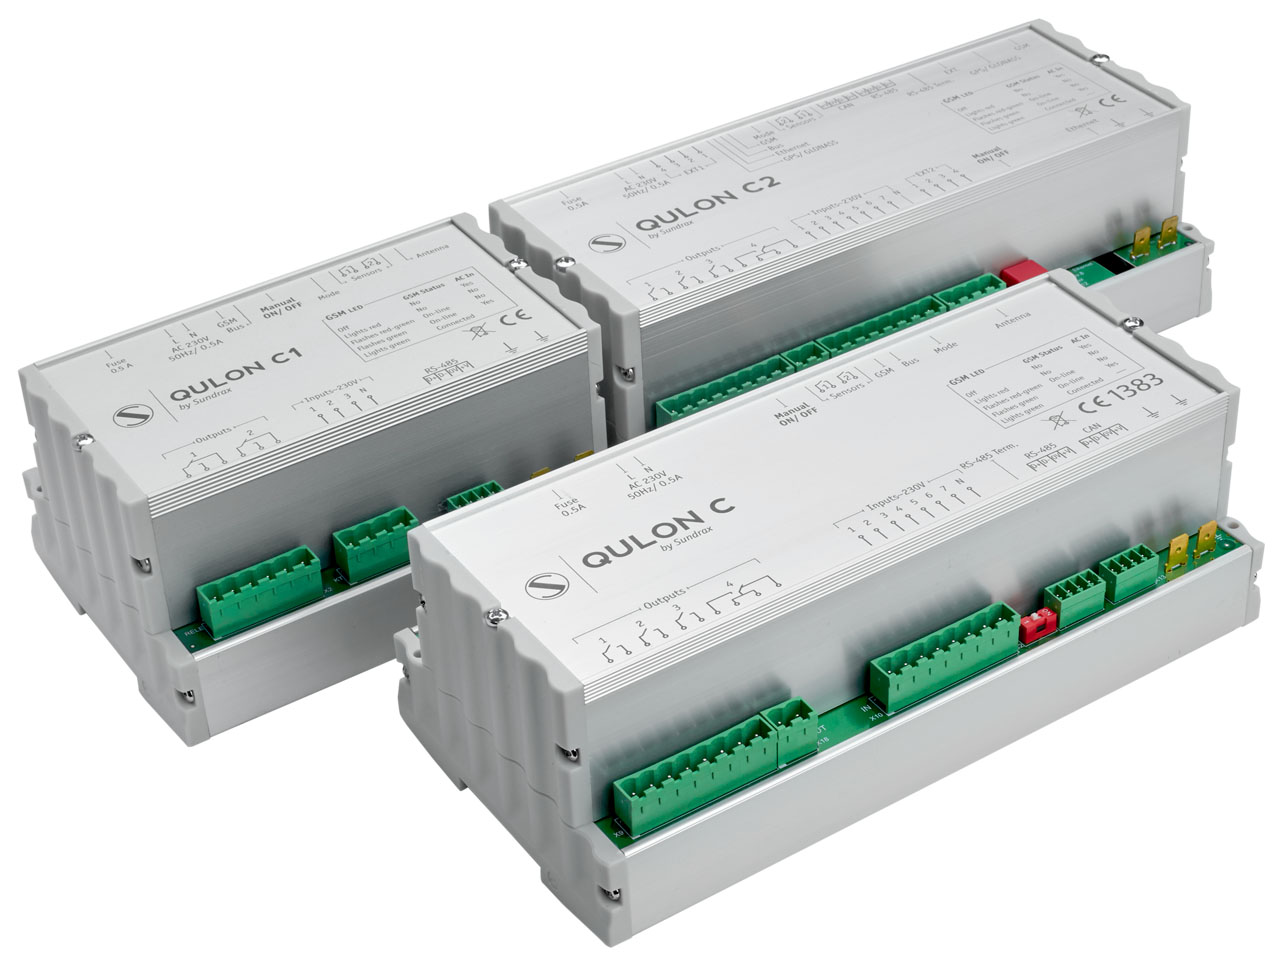 QULON C, QULON C1, QULON C2 — Gateways for Remote Lighting Control